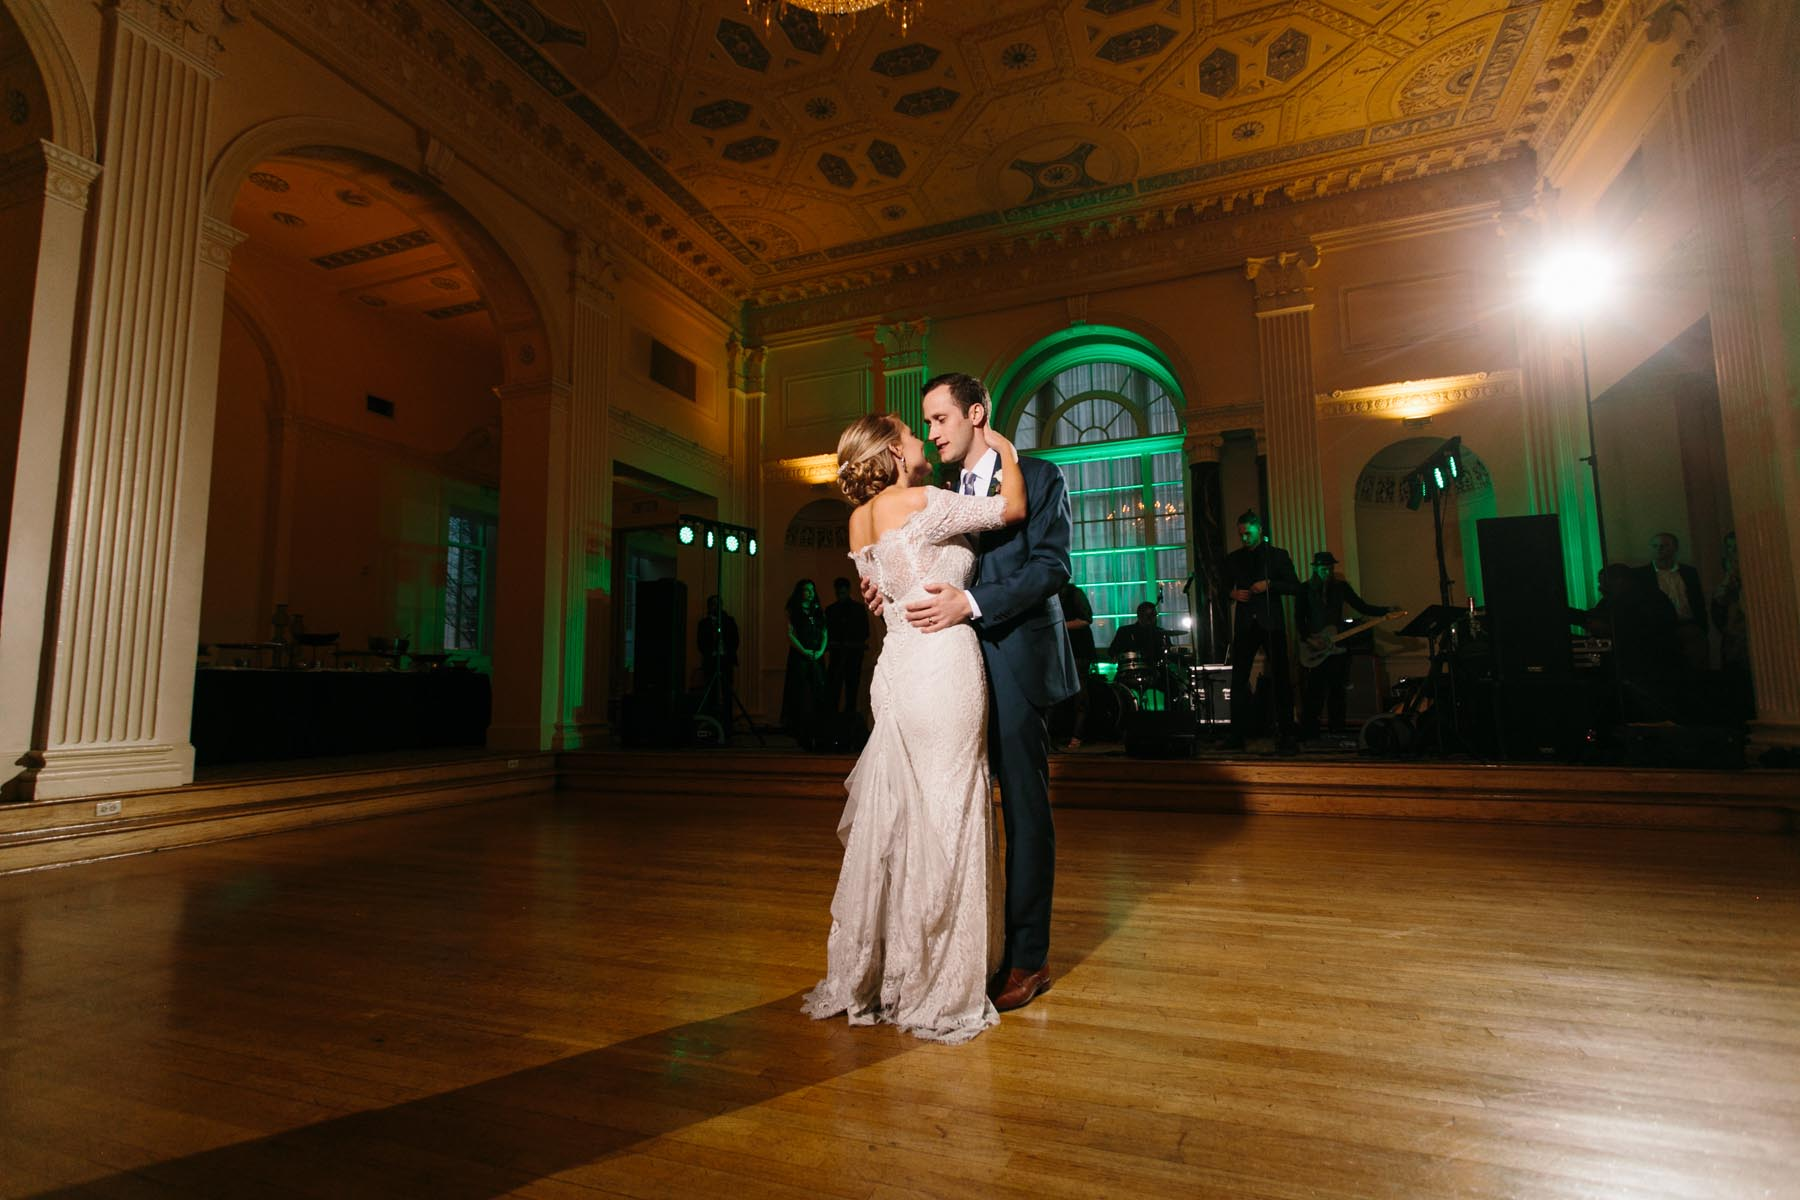 kjellman wedding blog biltmore wedding -95